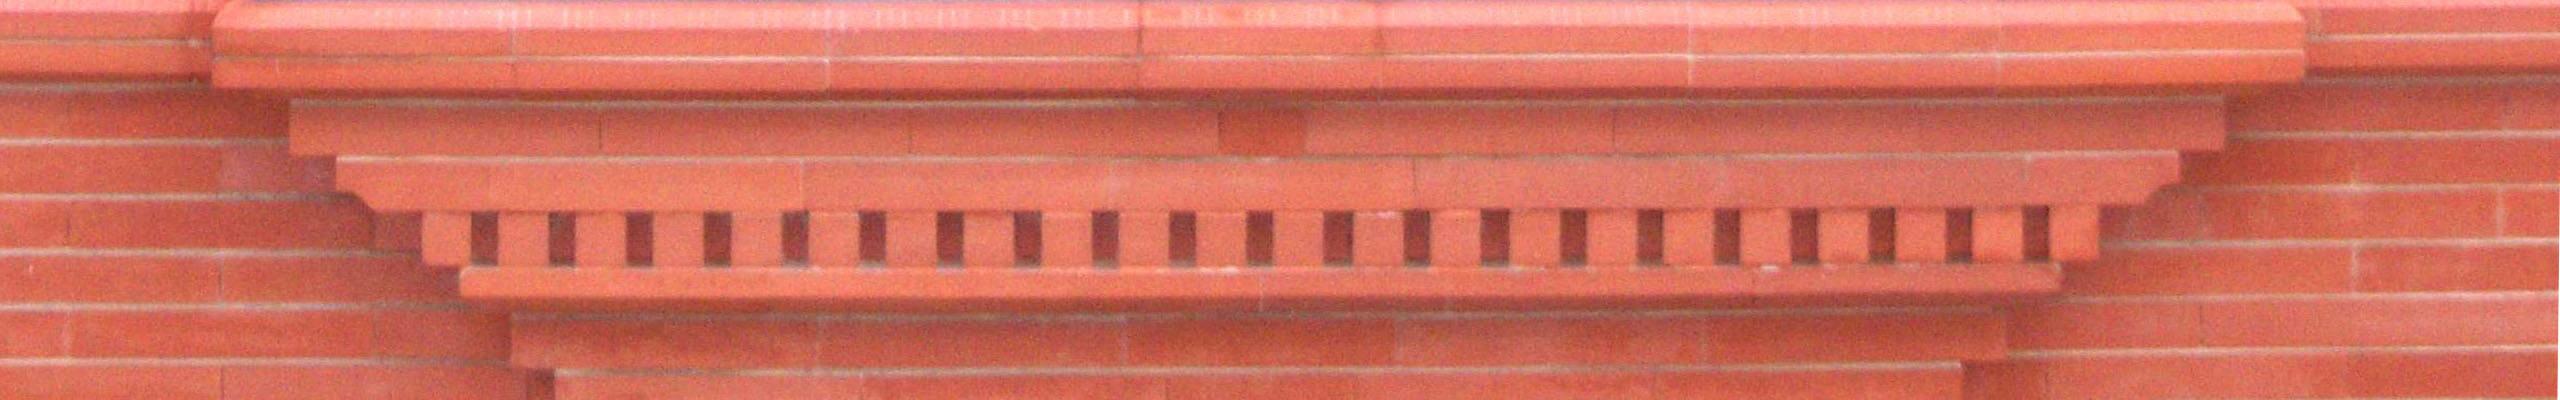 ladrillo-prensado-rojo-banner